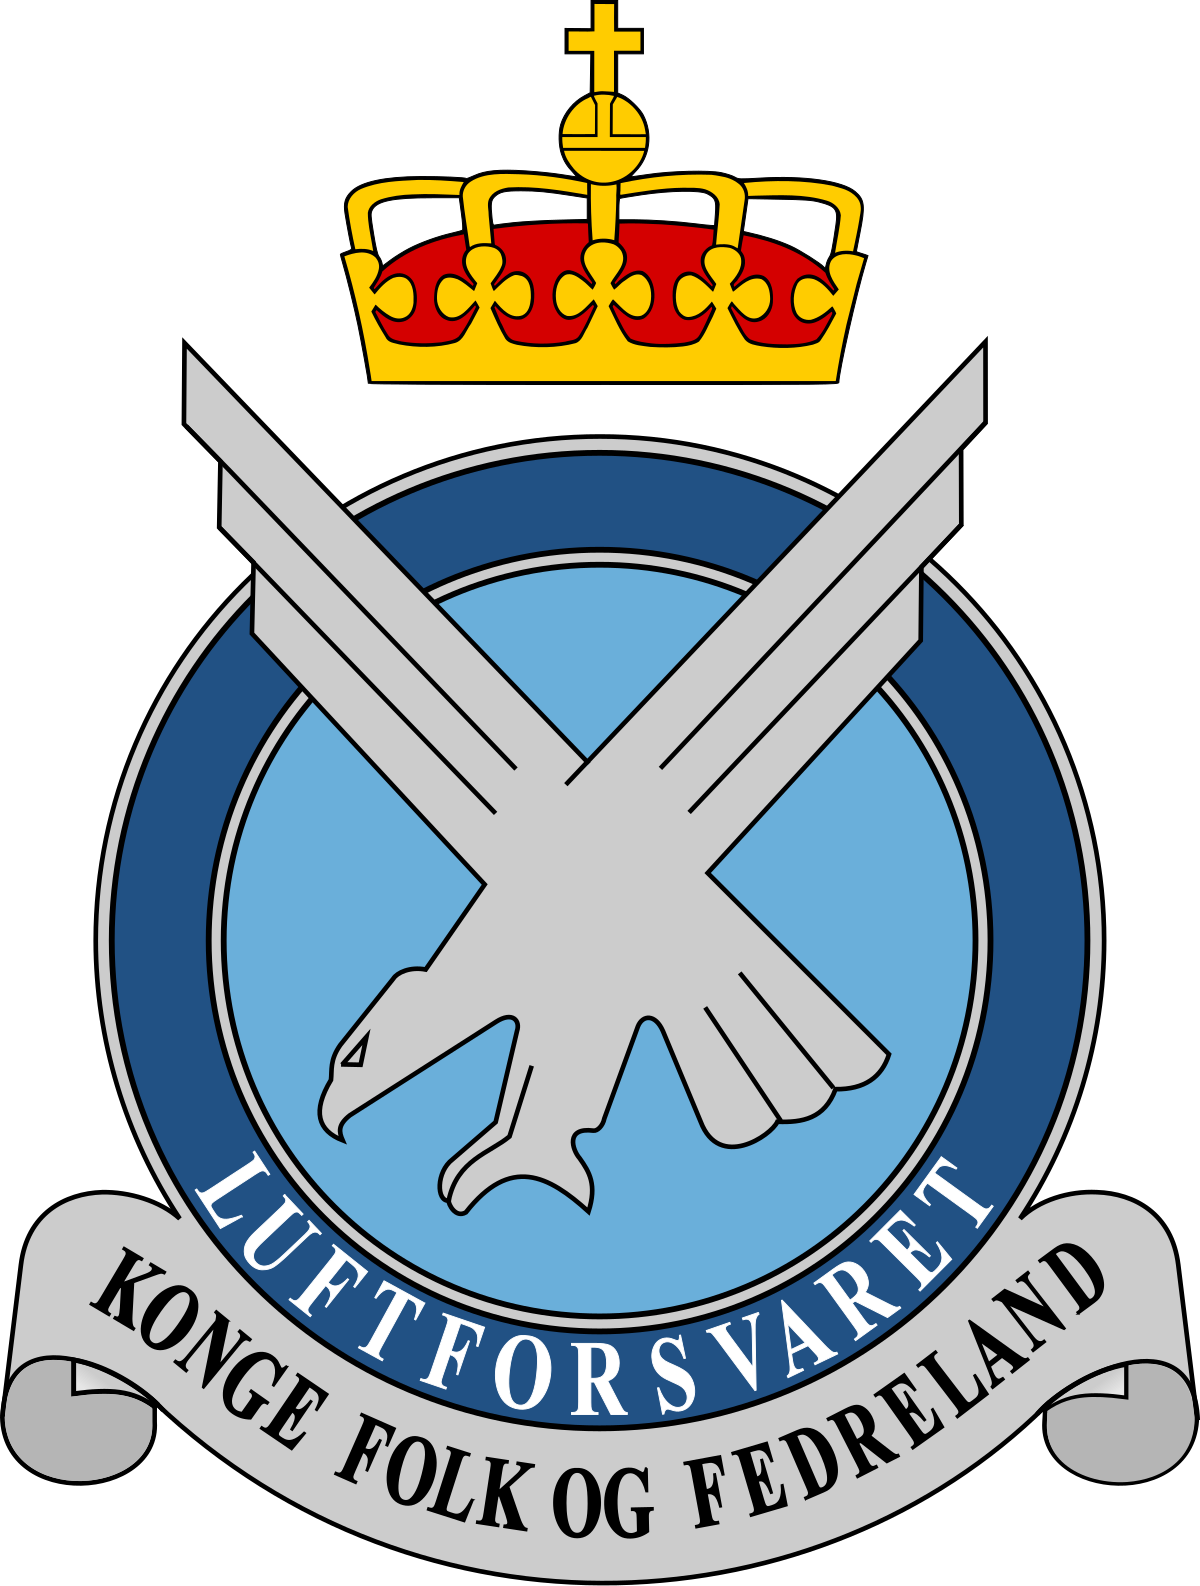 Vision clipart ww 2. Royal norwegian air force